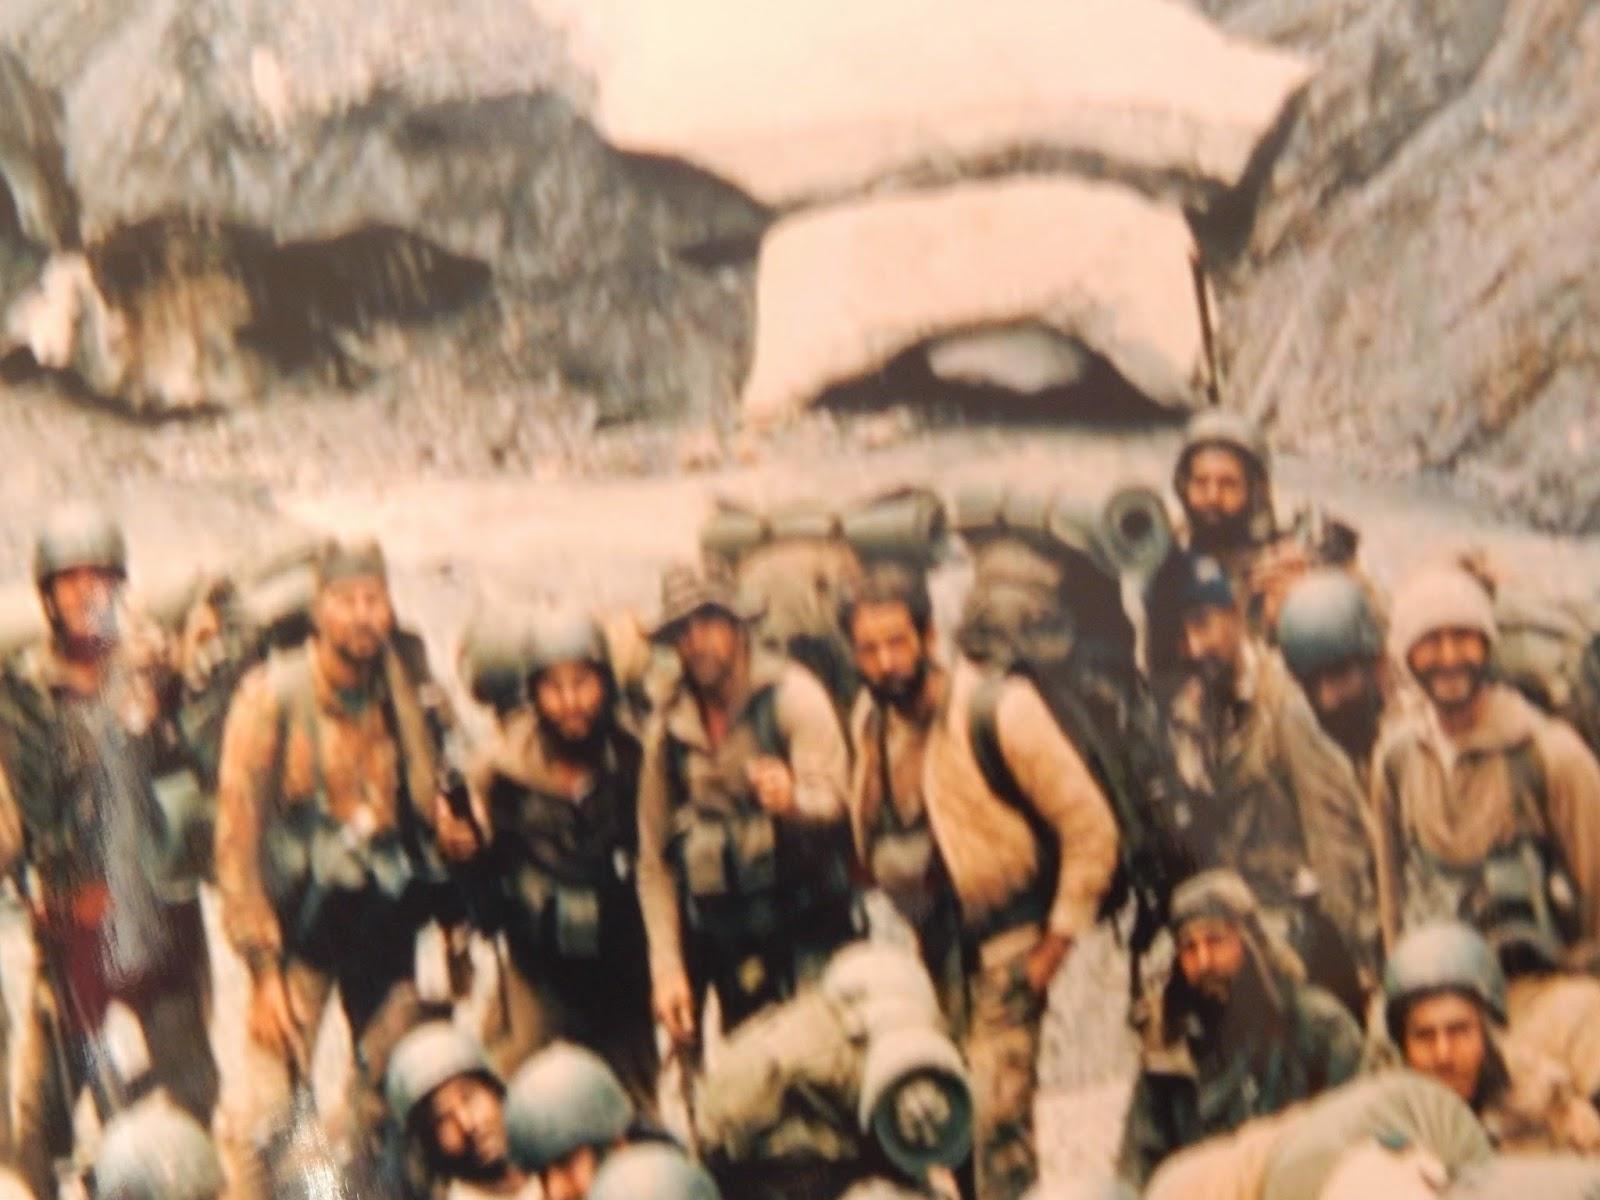 kargil war Essays - largest database of quality sample essays and research papers on kargil war.